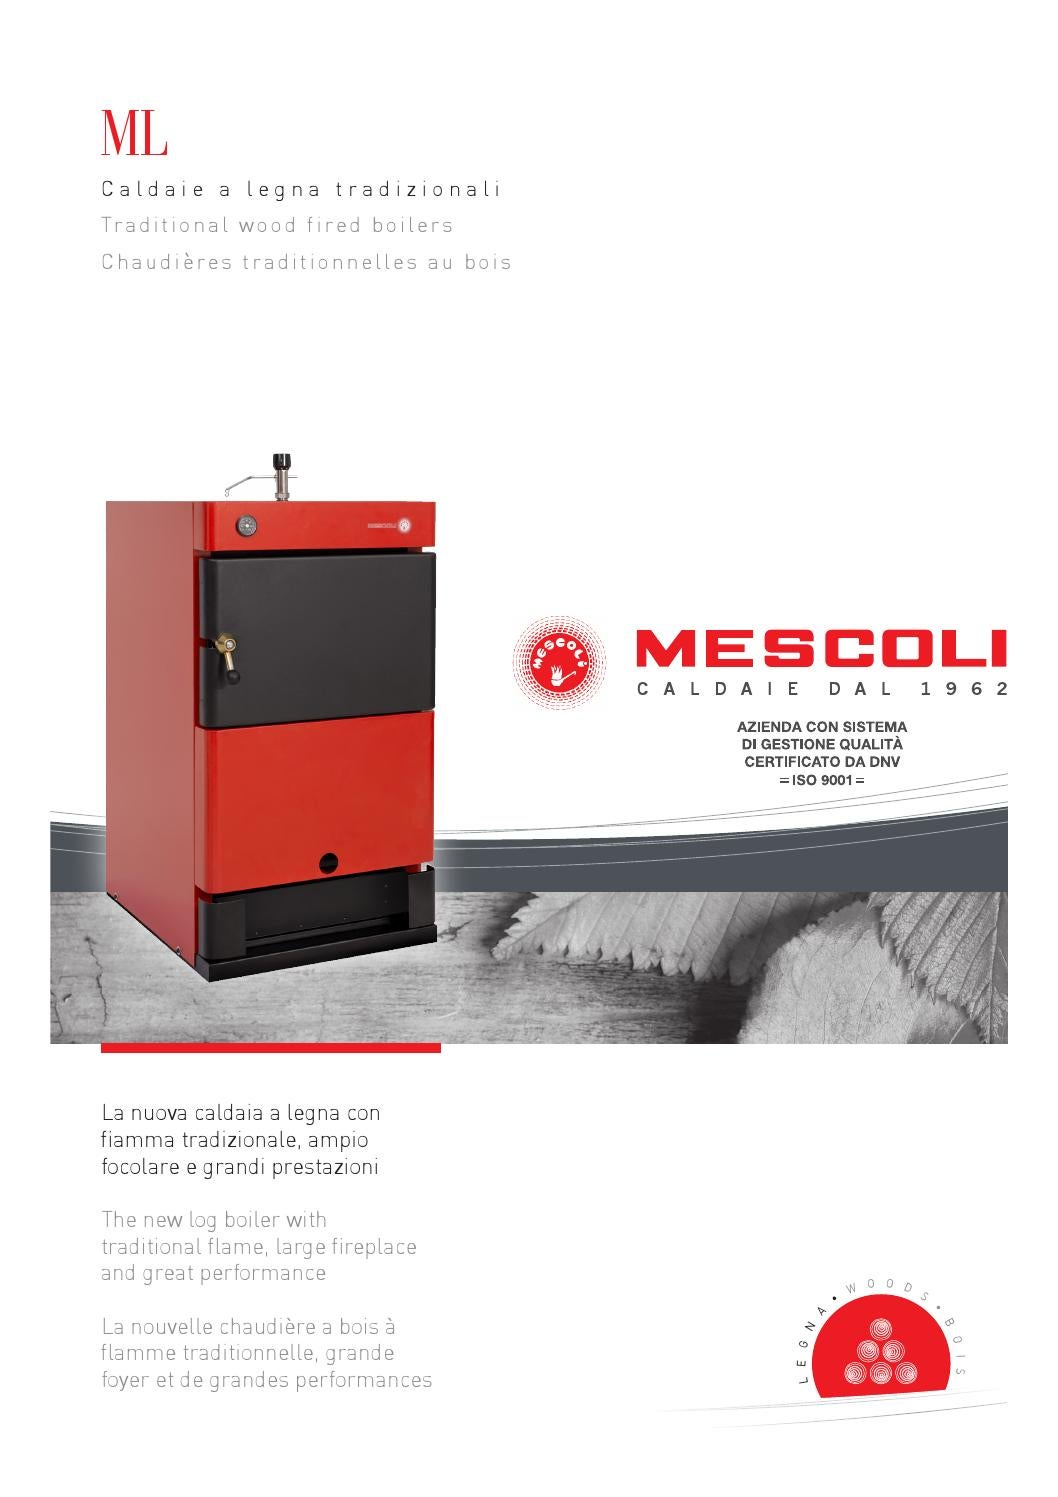 Mescoli serie ml a legna by idea studio caminetti issuu for Mescoli caldaie